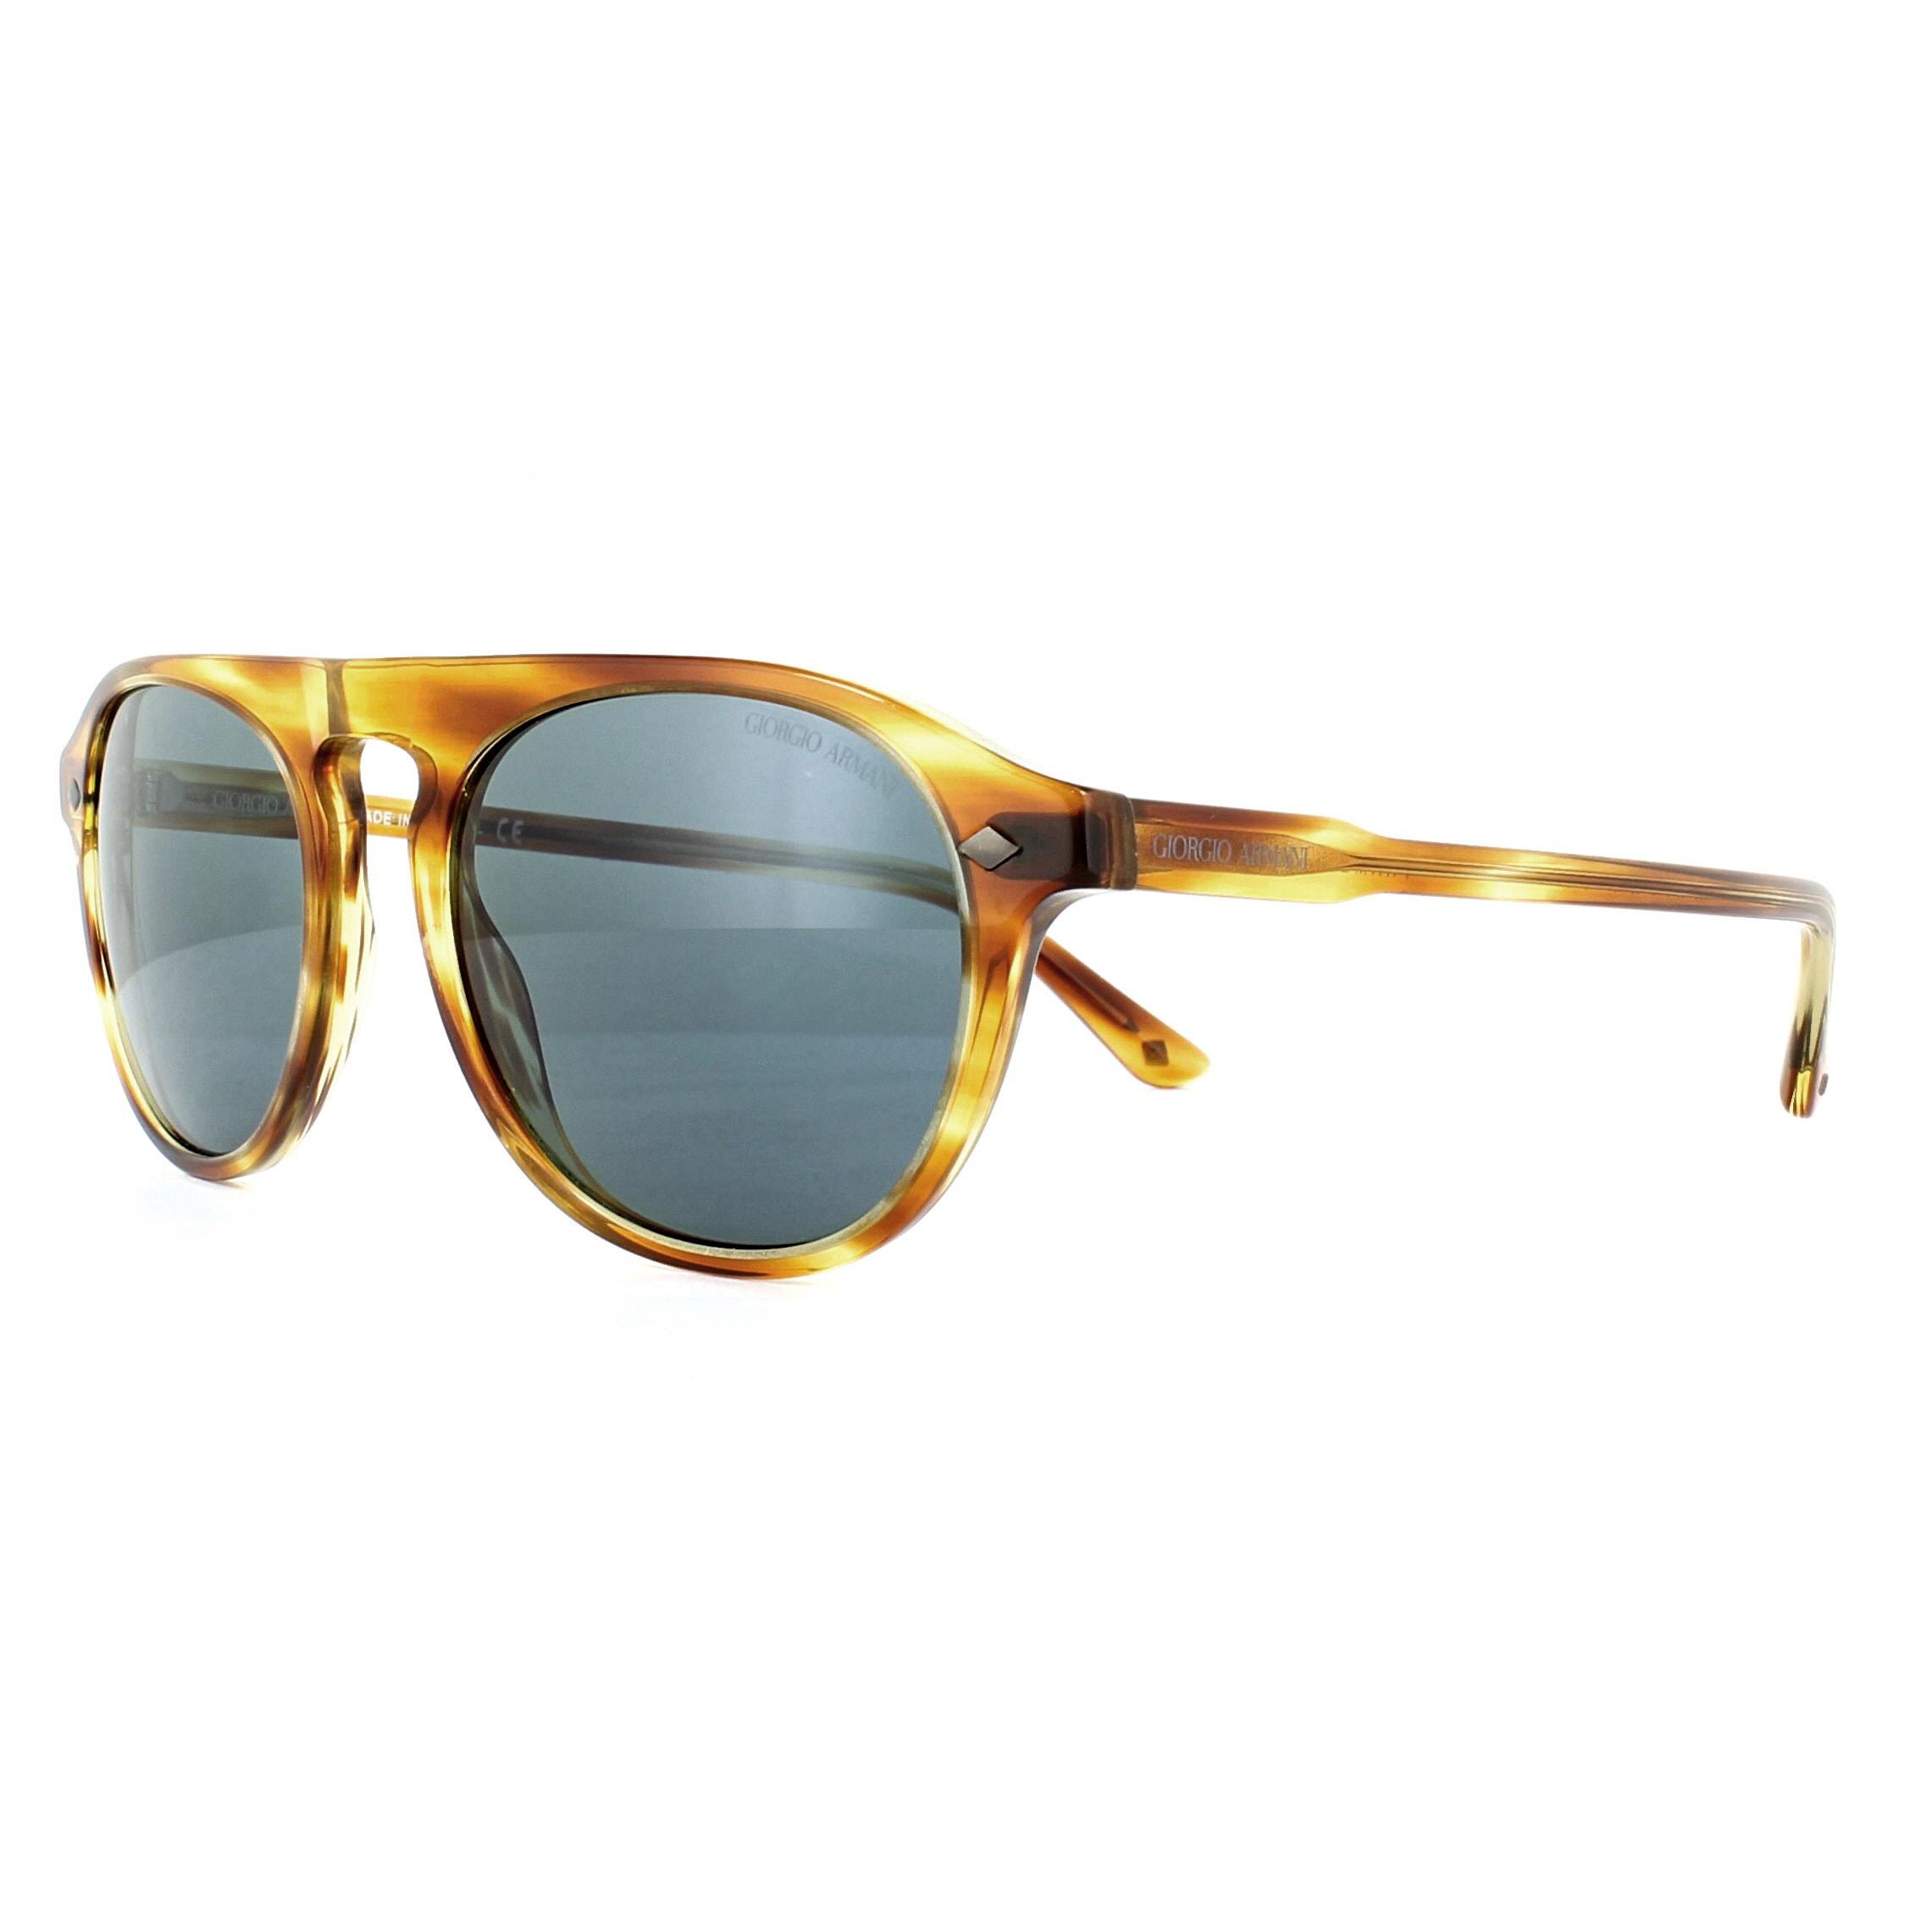 aeadf1c2bf61 Giorgio Armani Sunglasses AR8096 5579R5 Striped Straw Grey ...